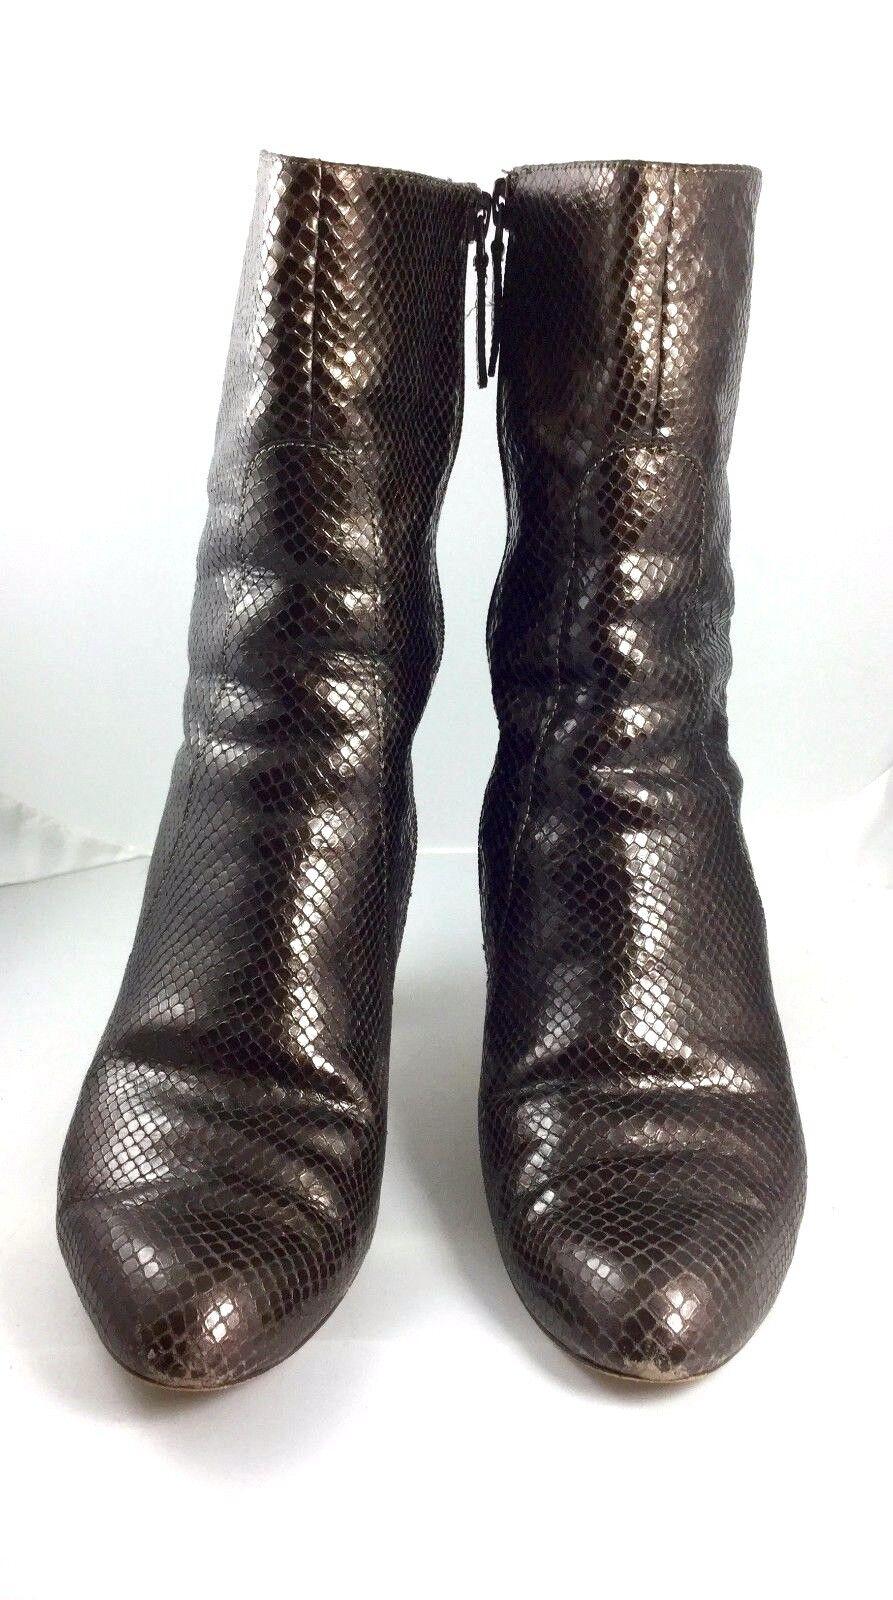 COLE HAAN Dark Brown Snake Embossed Leather  Harper  Mid Calf Bootie Size 7